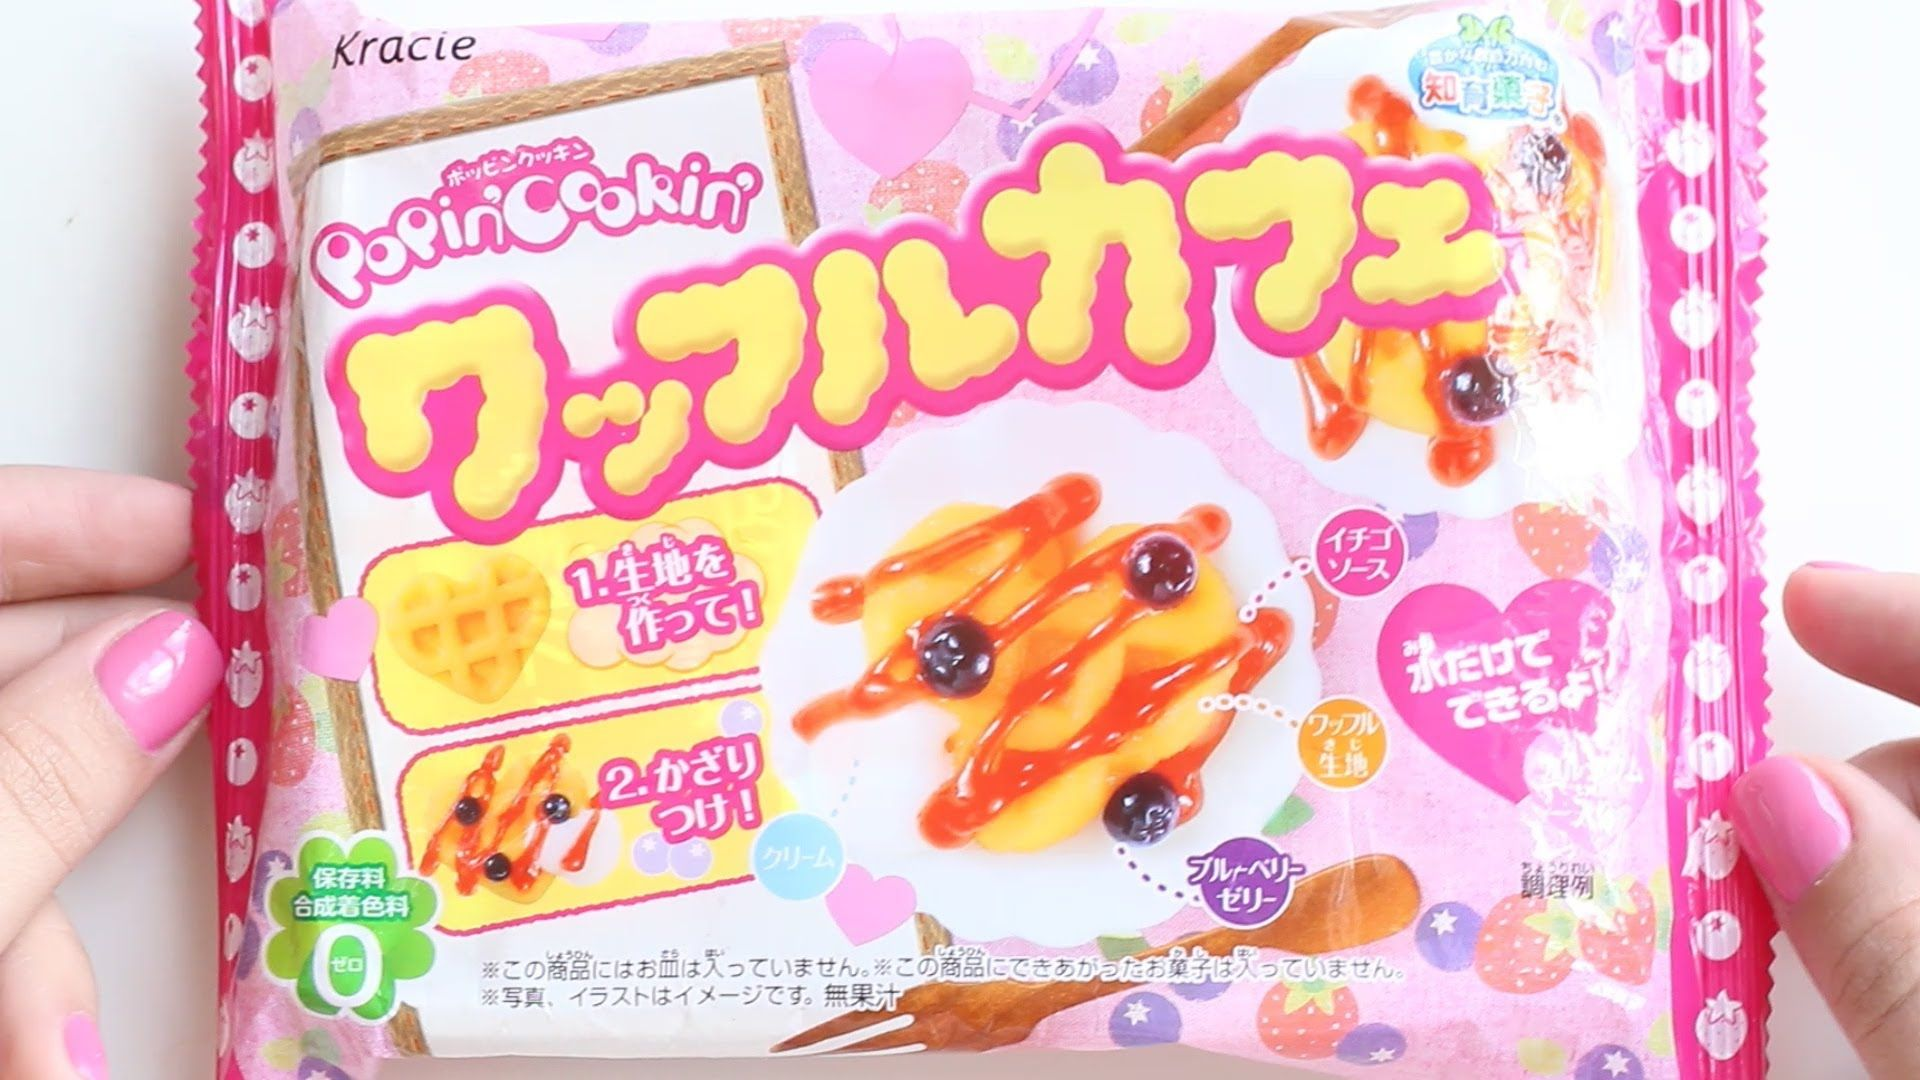 kit caramelle Kracie Popin Cookin DIY Sushi dal Giappone